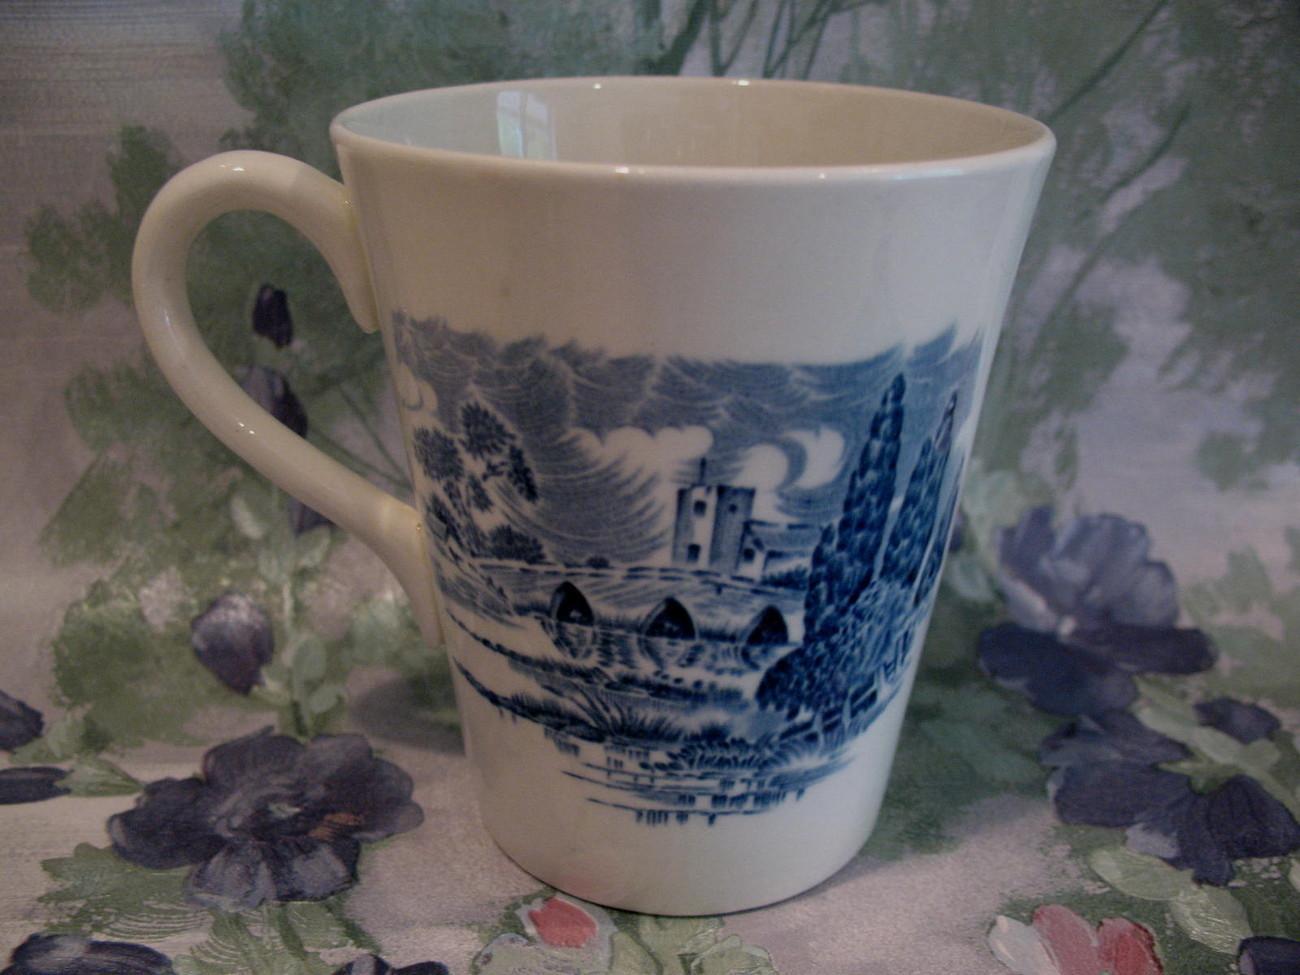 Countryside Enoch Wedgwood Coffee Mug Tea Cup Vintage